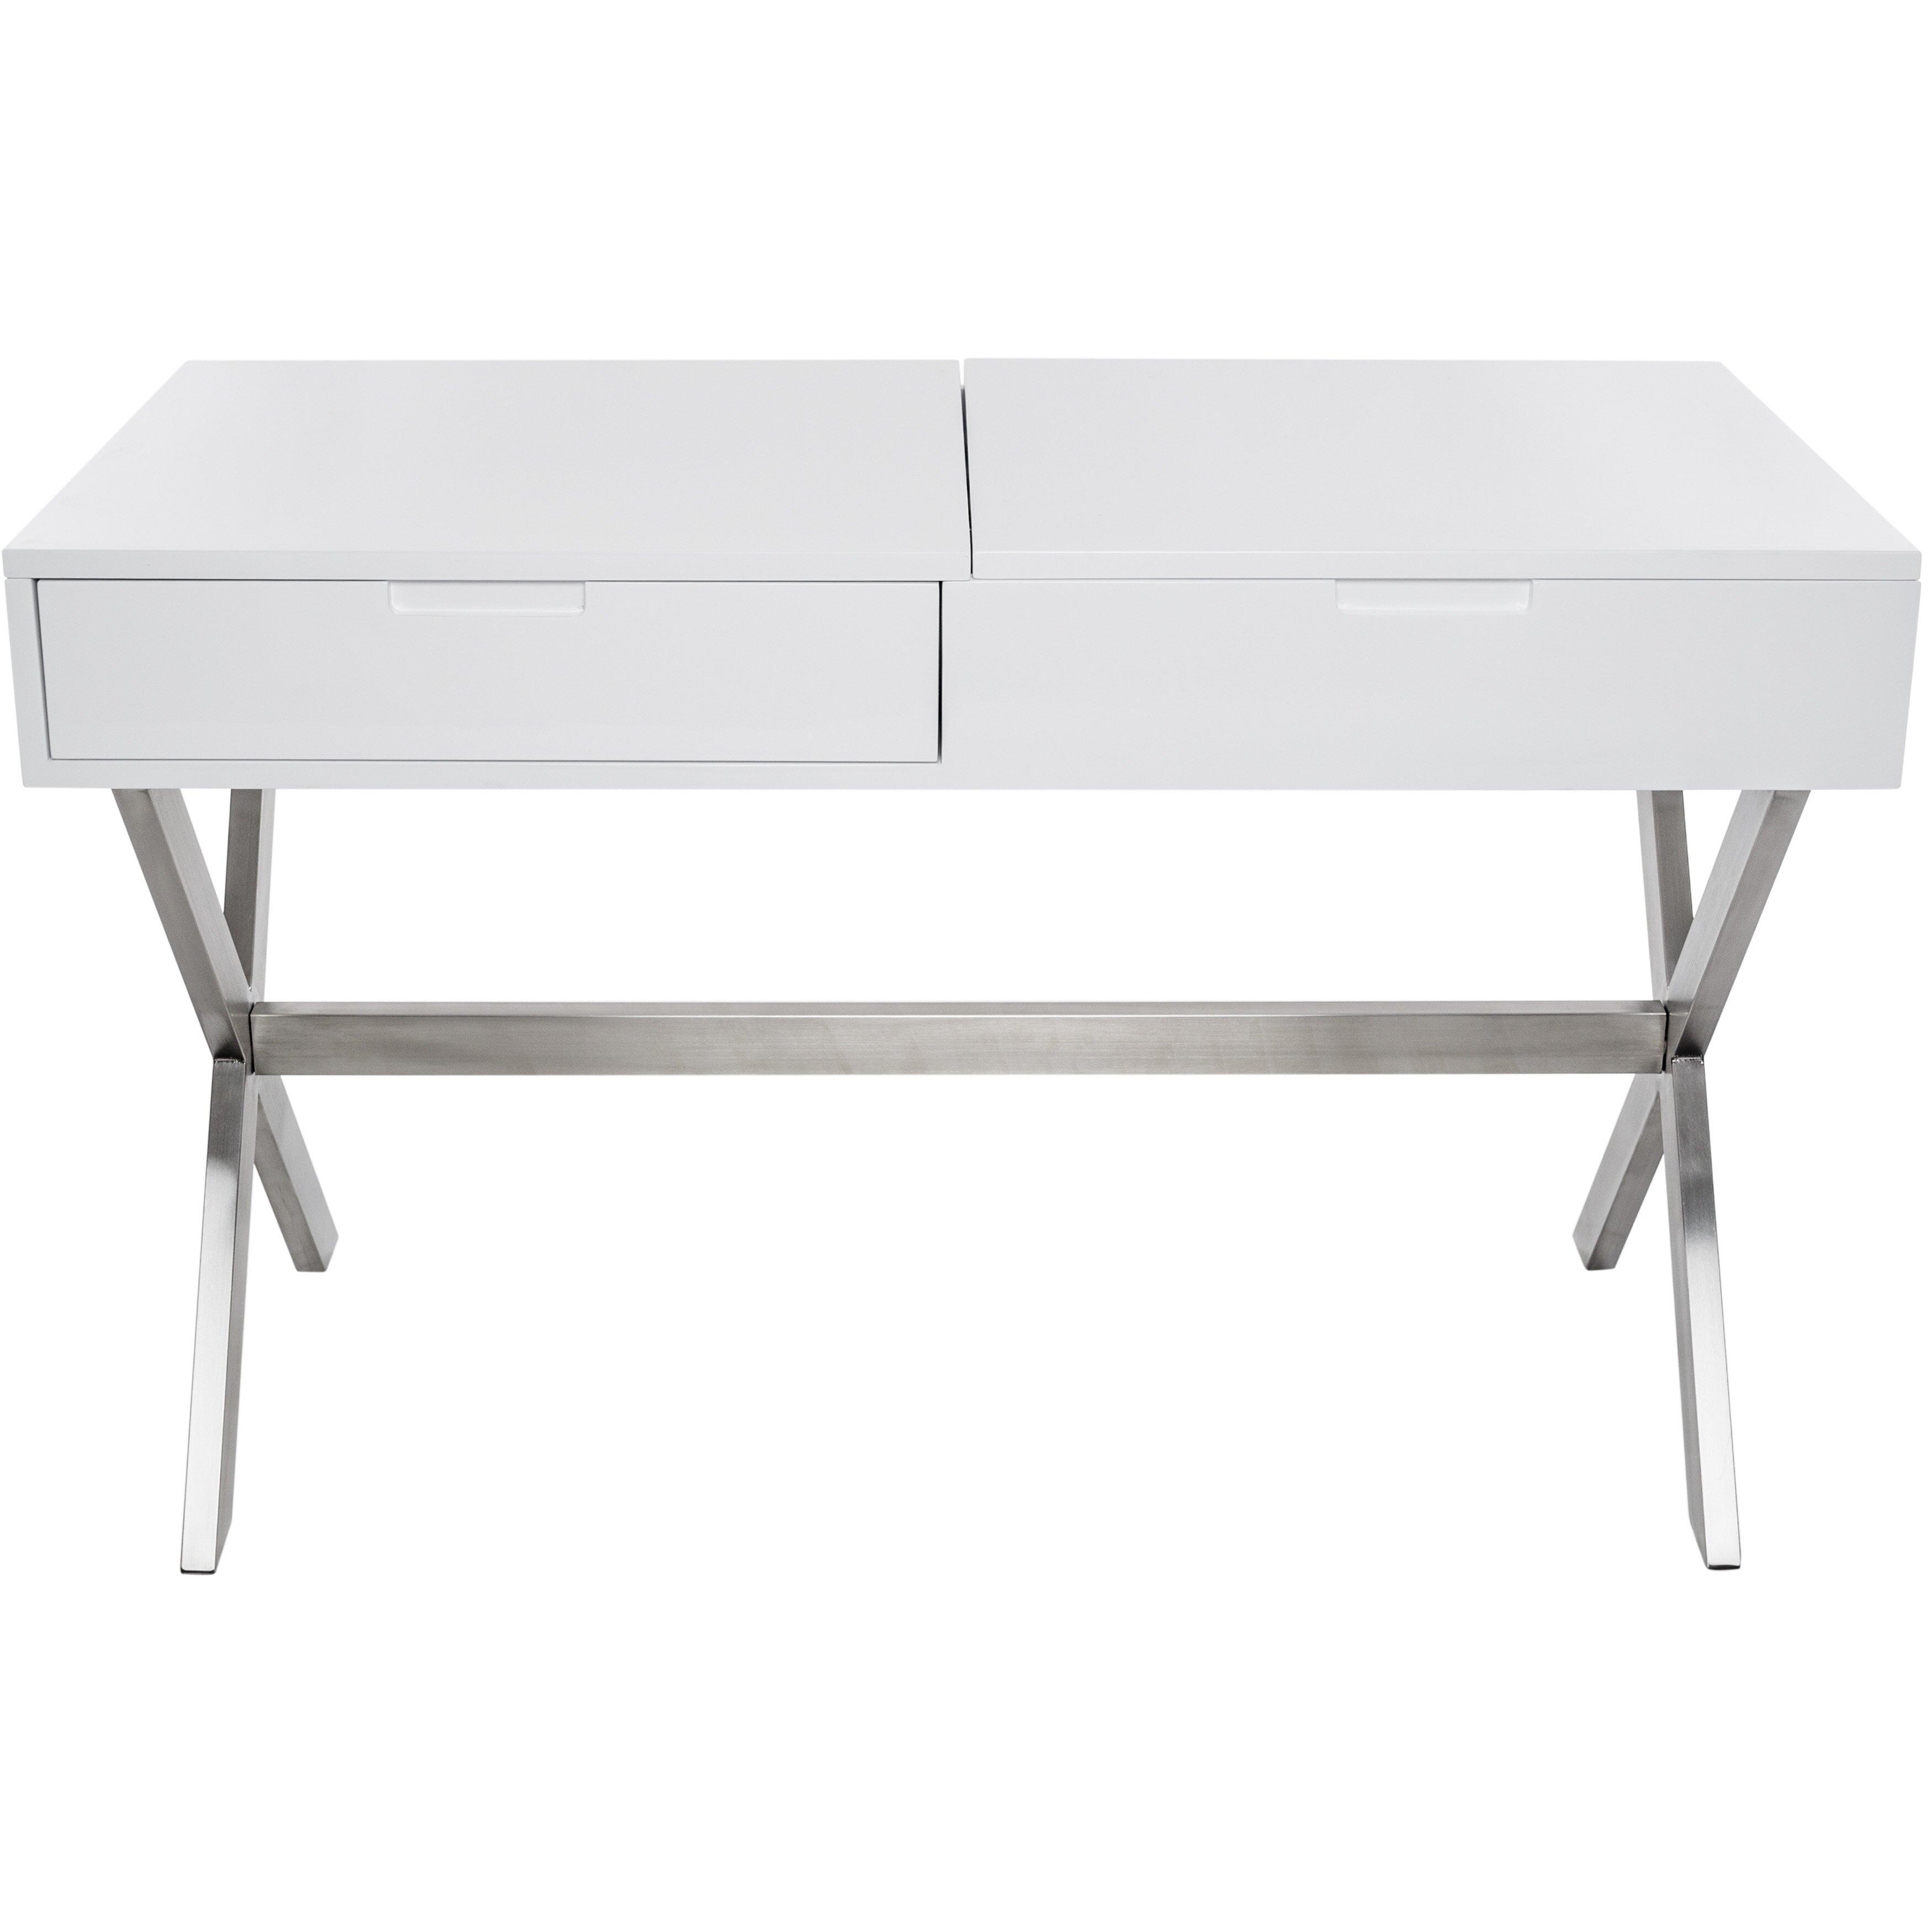 #6A6661 Matrix Porsha Desk Vanity Set With Mirror & Reviews Wayfair with 3500x3500 px of Best Wayfair White Desk 35003500 image @ avoidforclosure.info